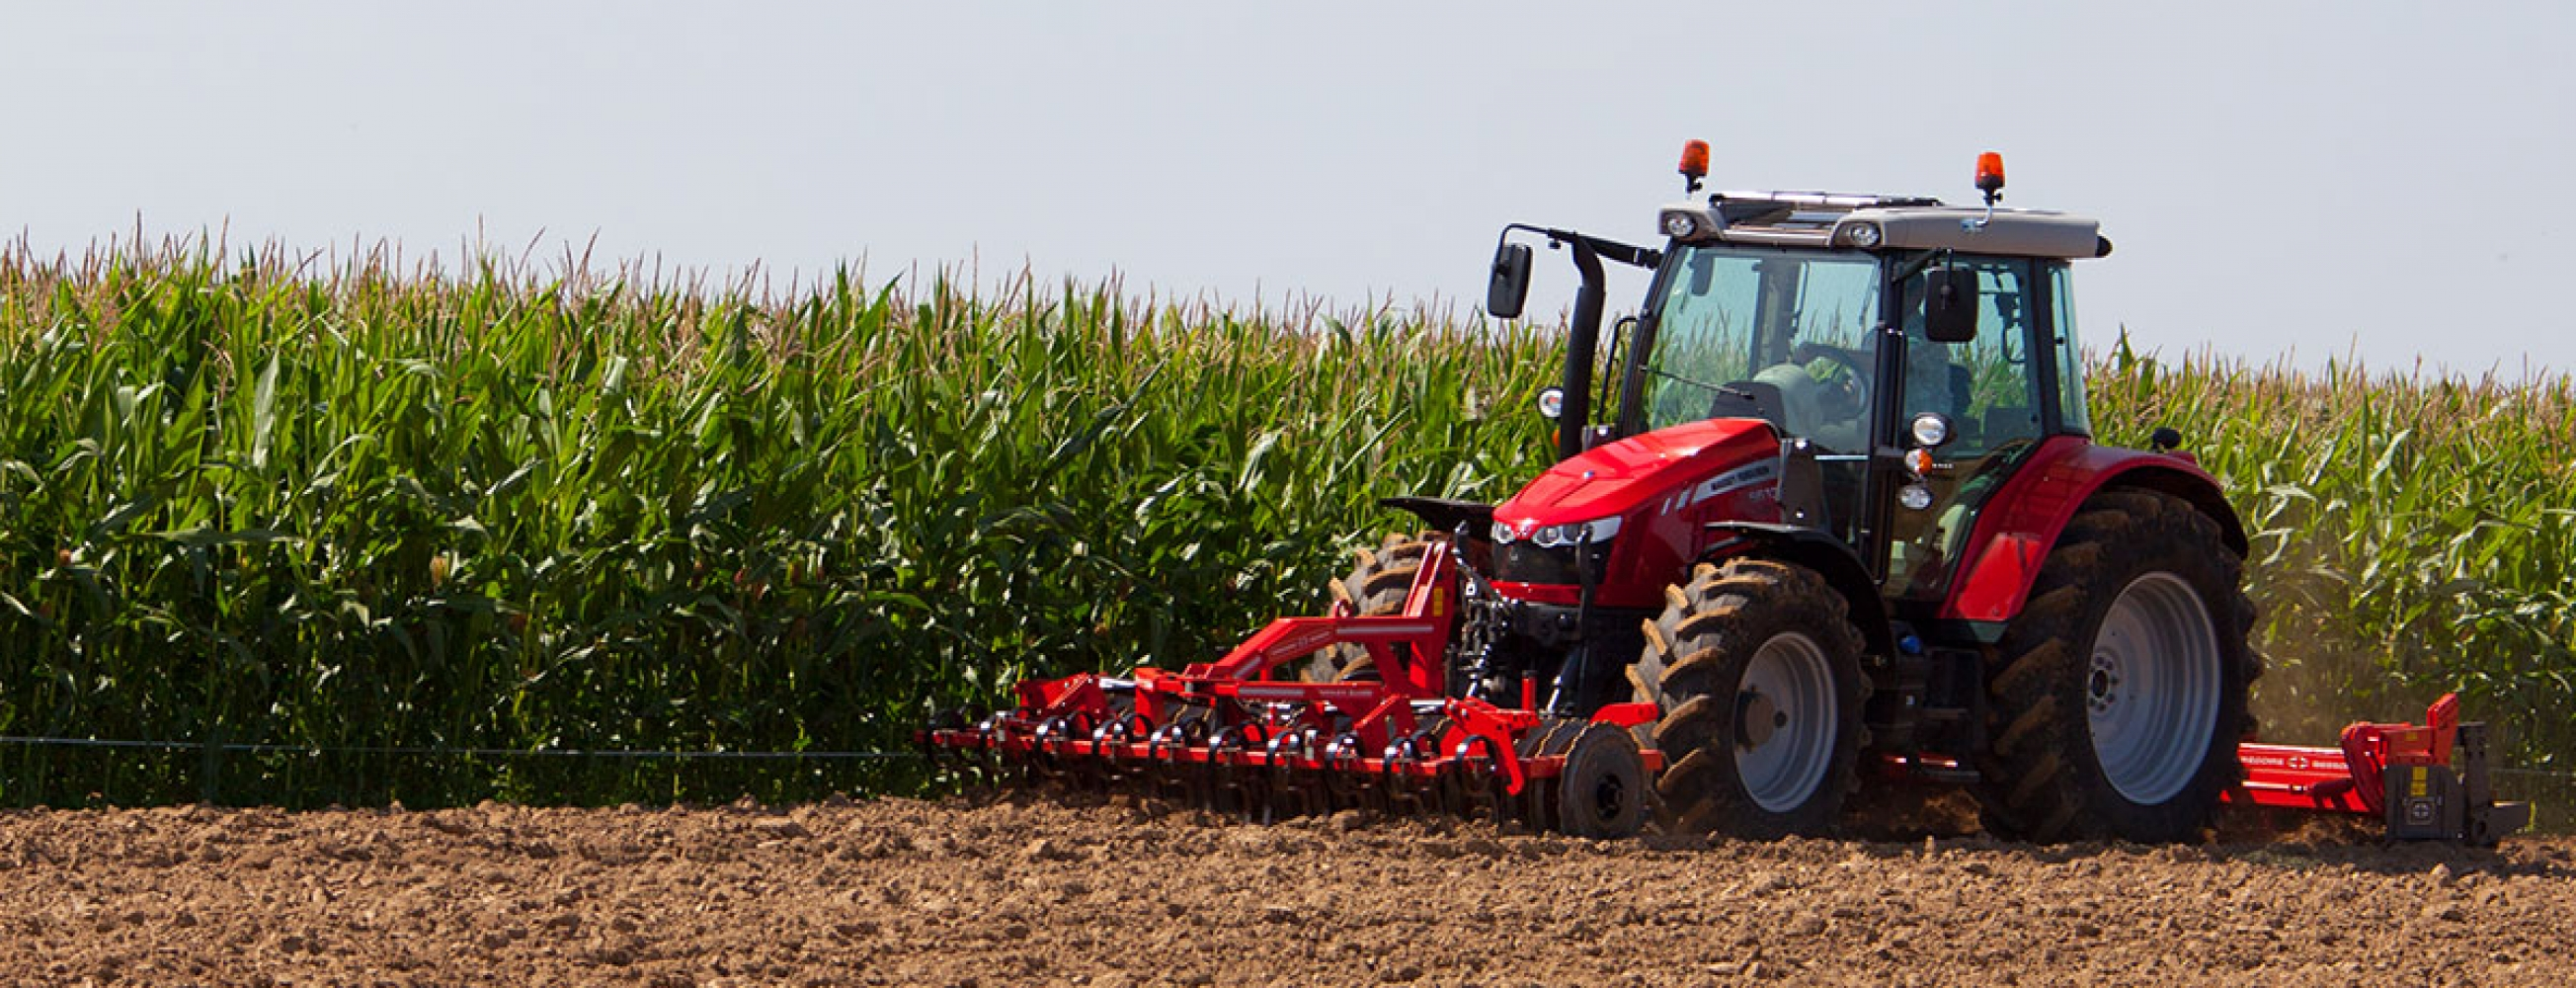 Massey-Ferguson-tractor-for-sale